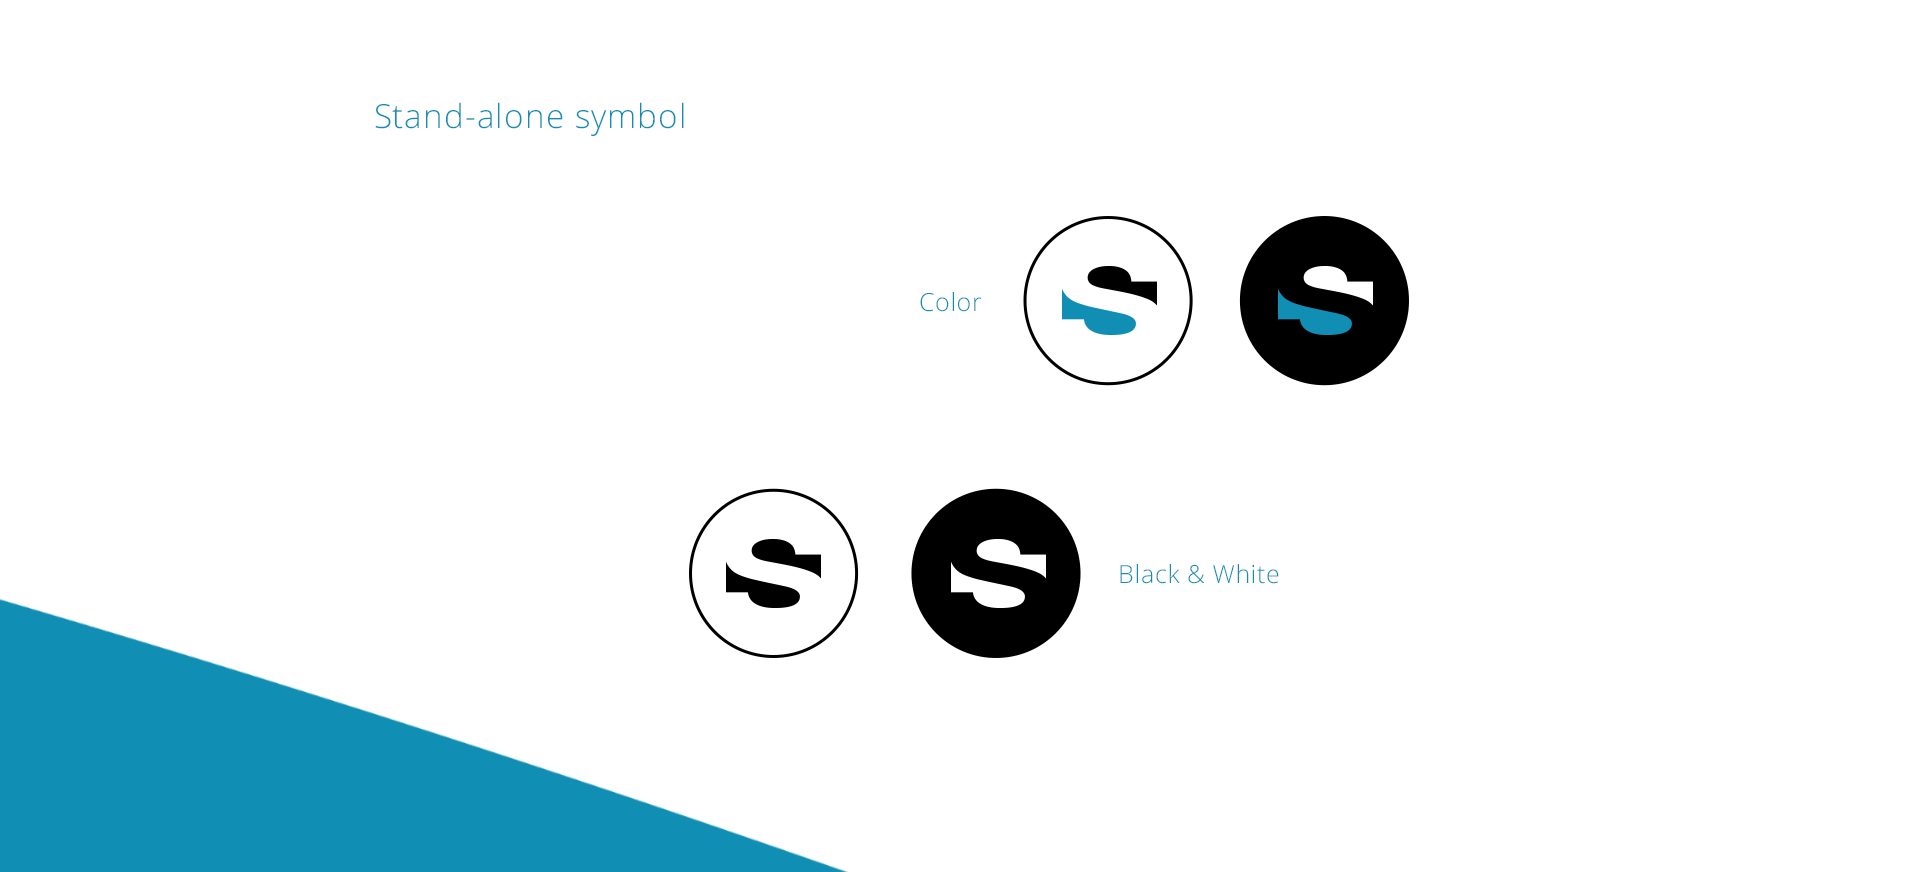 Stand-alone symbol design